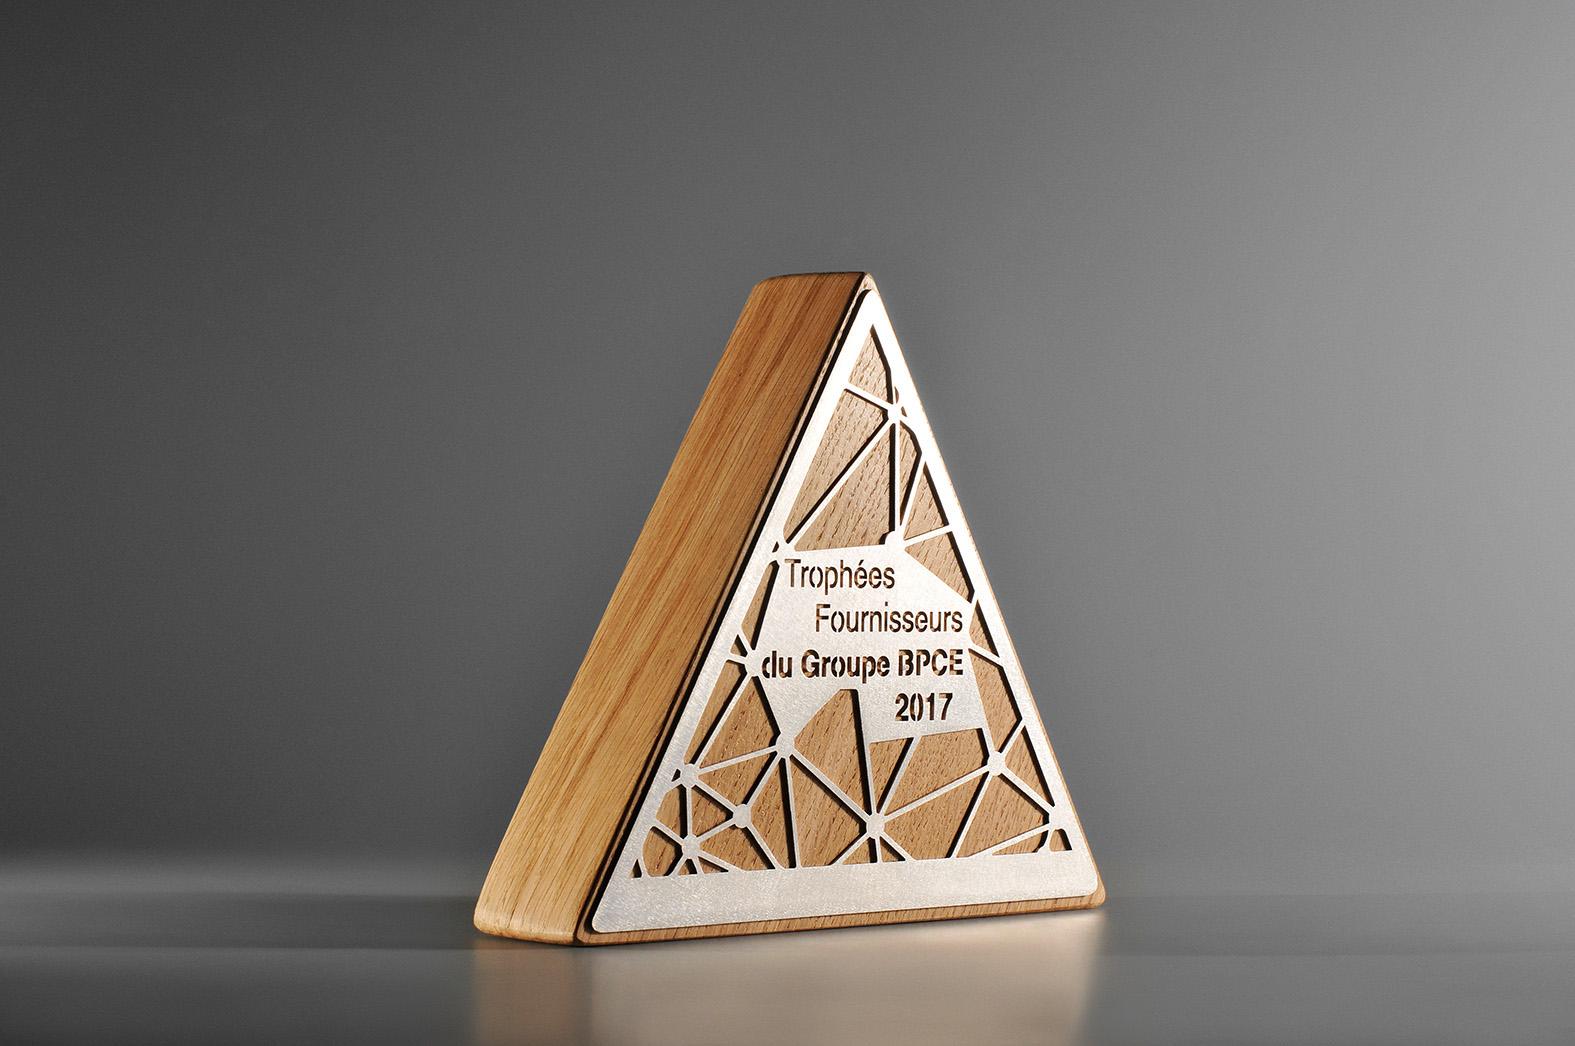 b25 troph e triangle en bois et m tal artempo. Black Bedroom Furniture Sets. Home Design Ideas